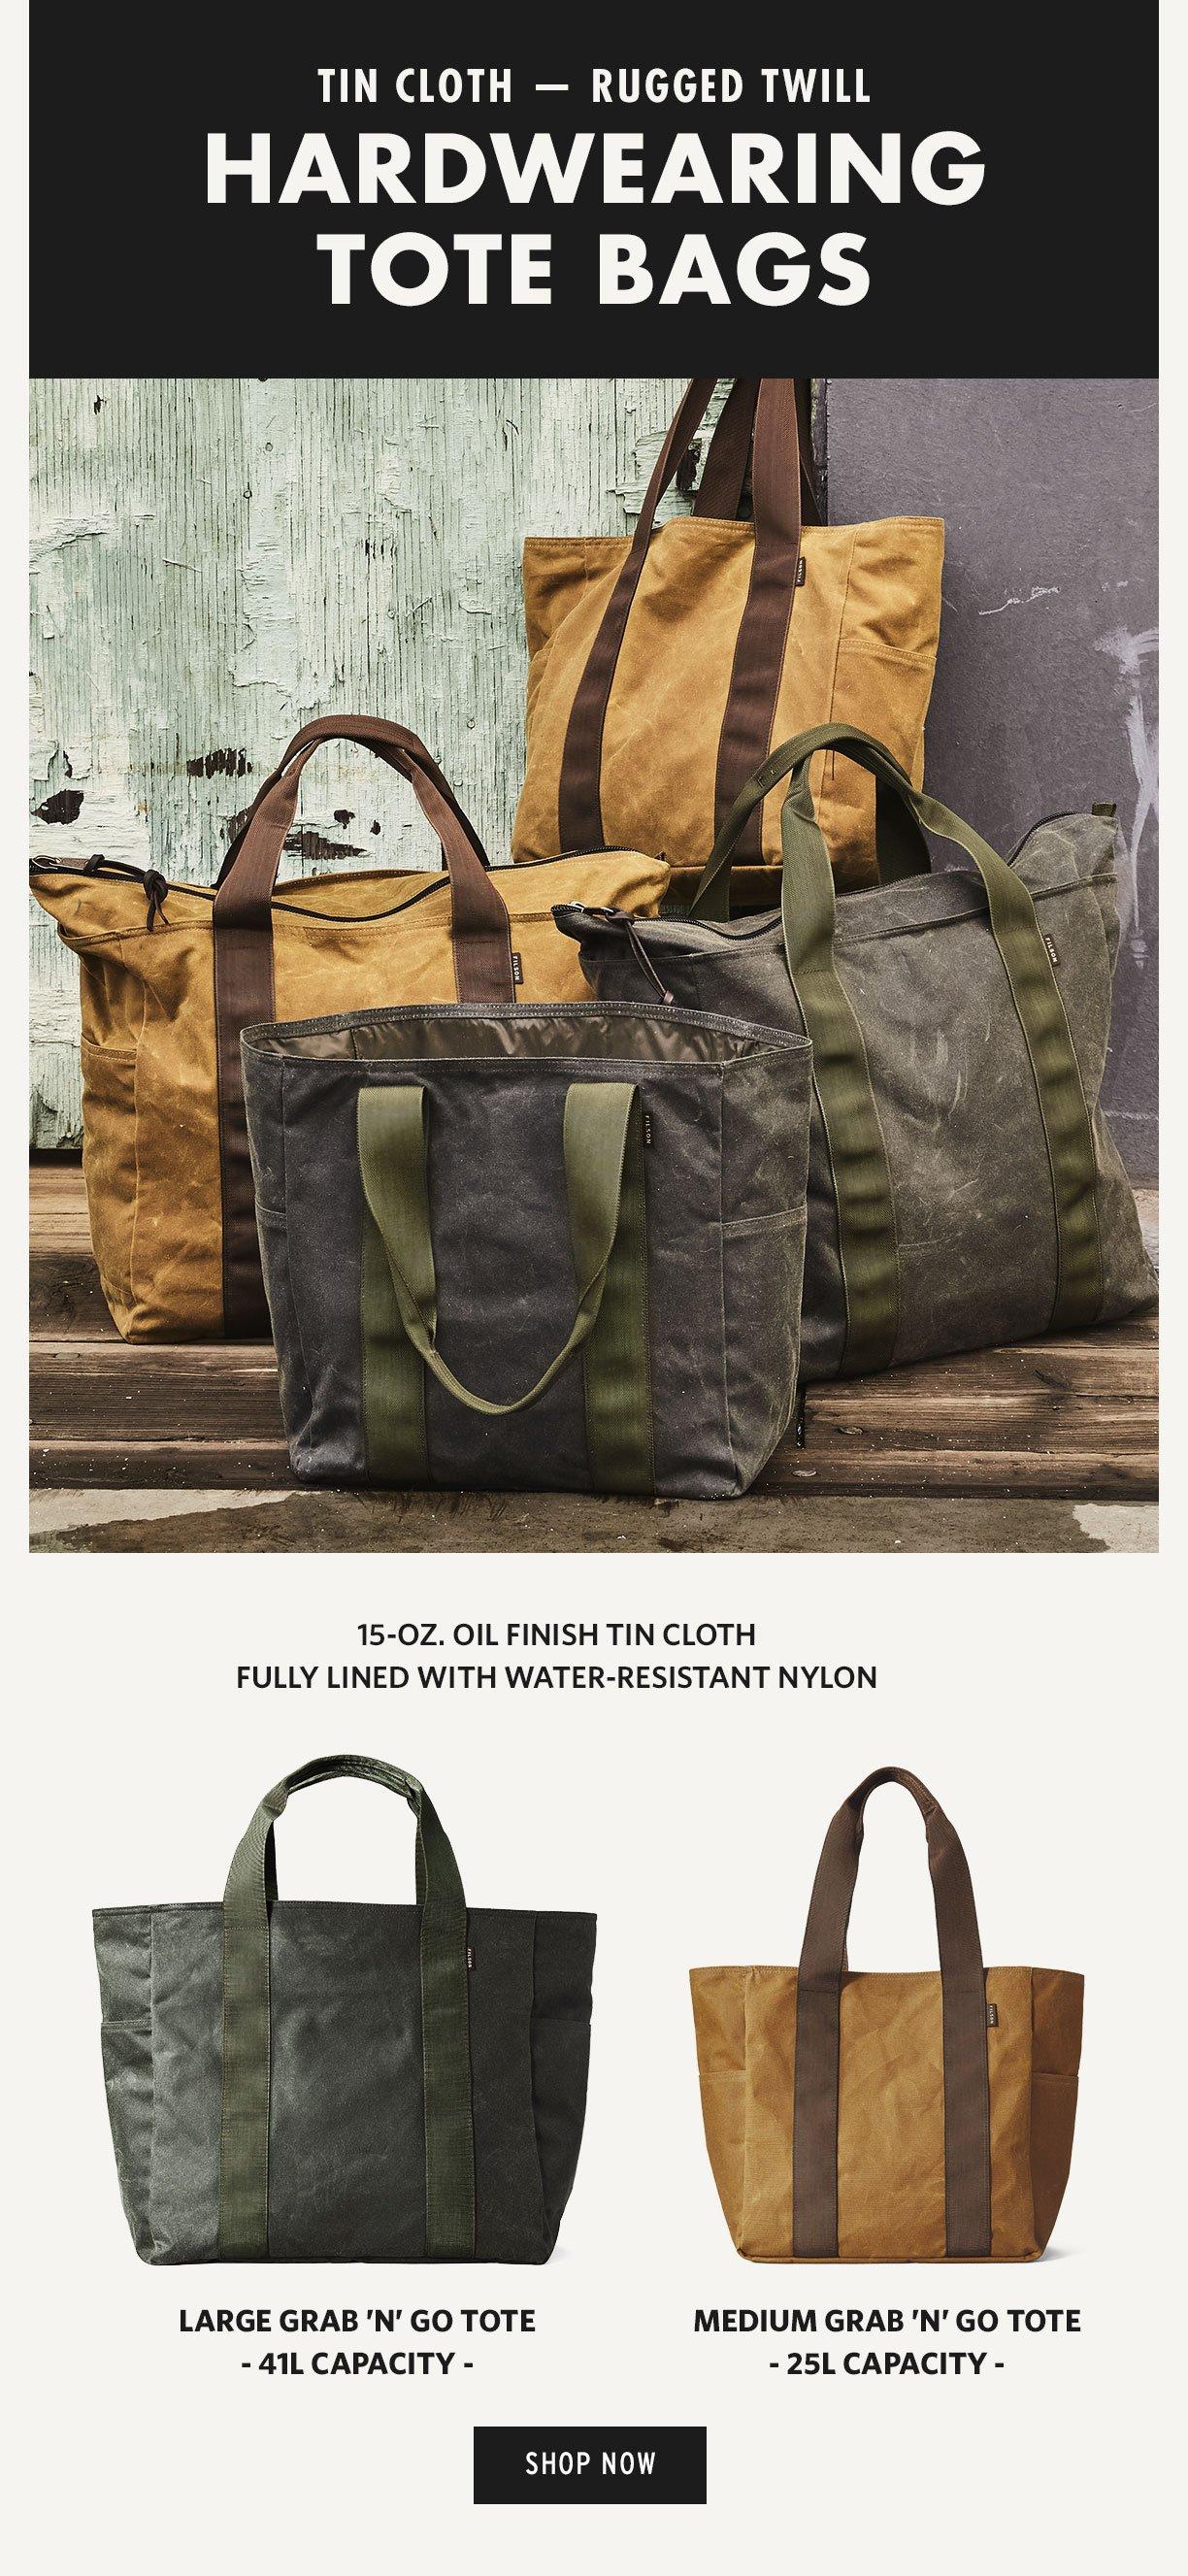 Filson Heavy Duty Tote Bags Milled